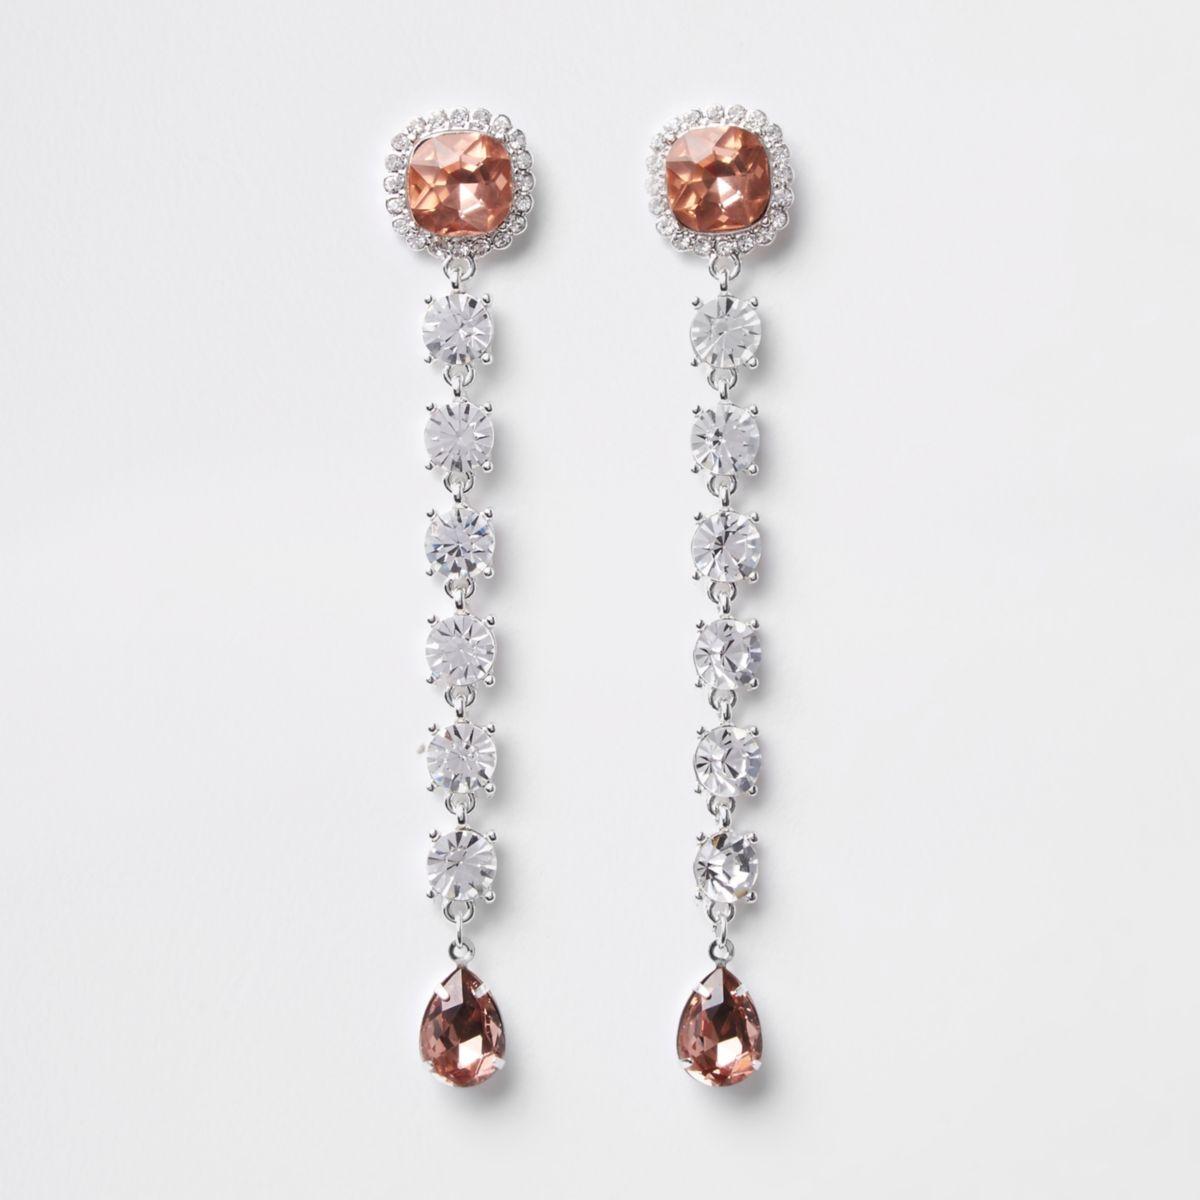 Silver tone rhinestone drop earring